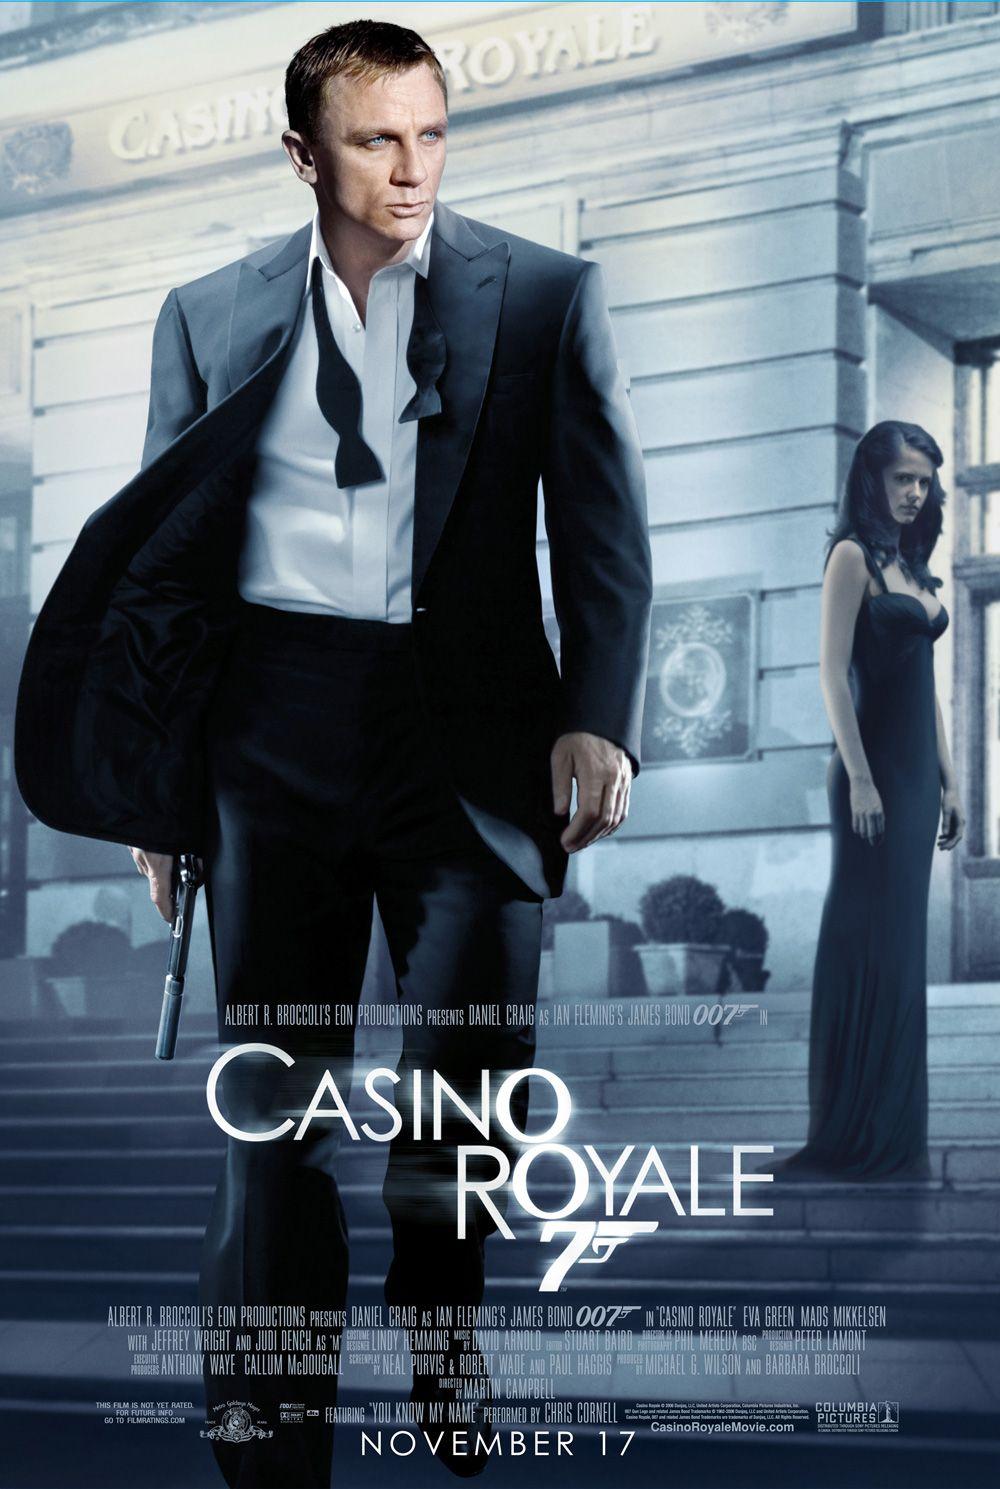 James bond casino royale warum stirbt vesper casino gaillard ouverture